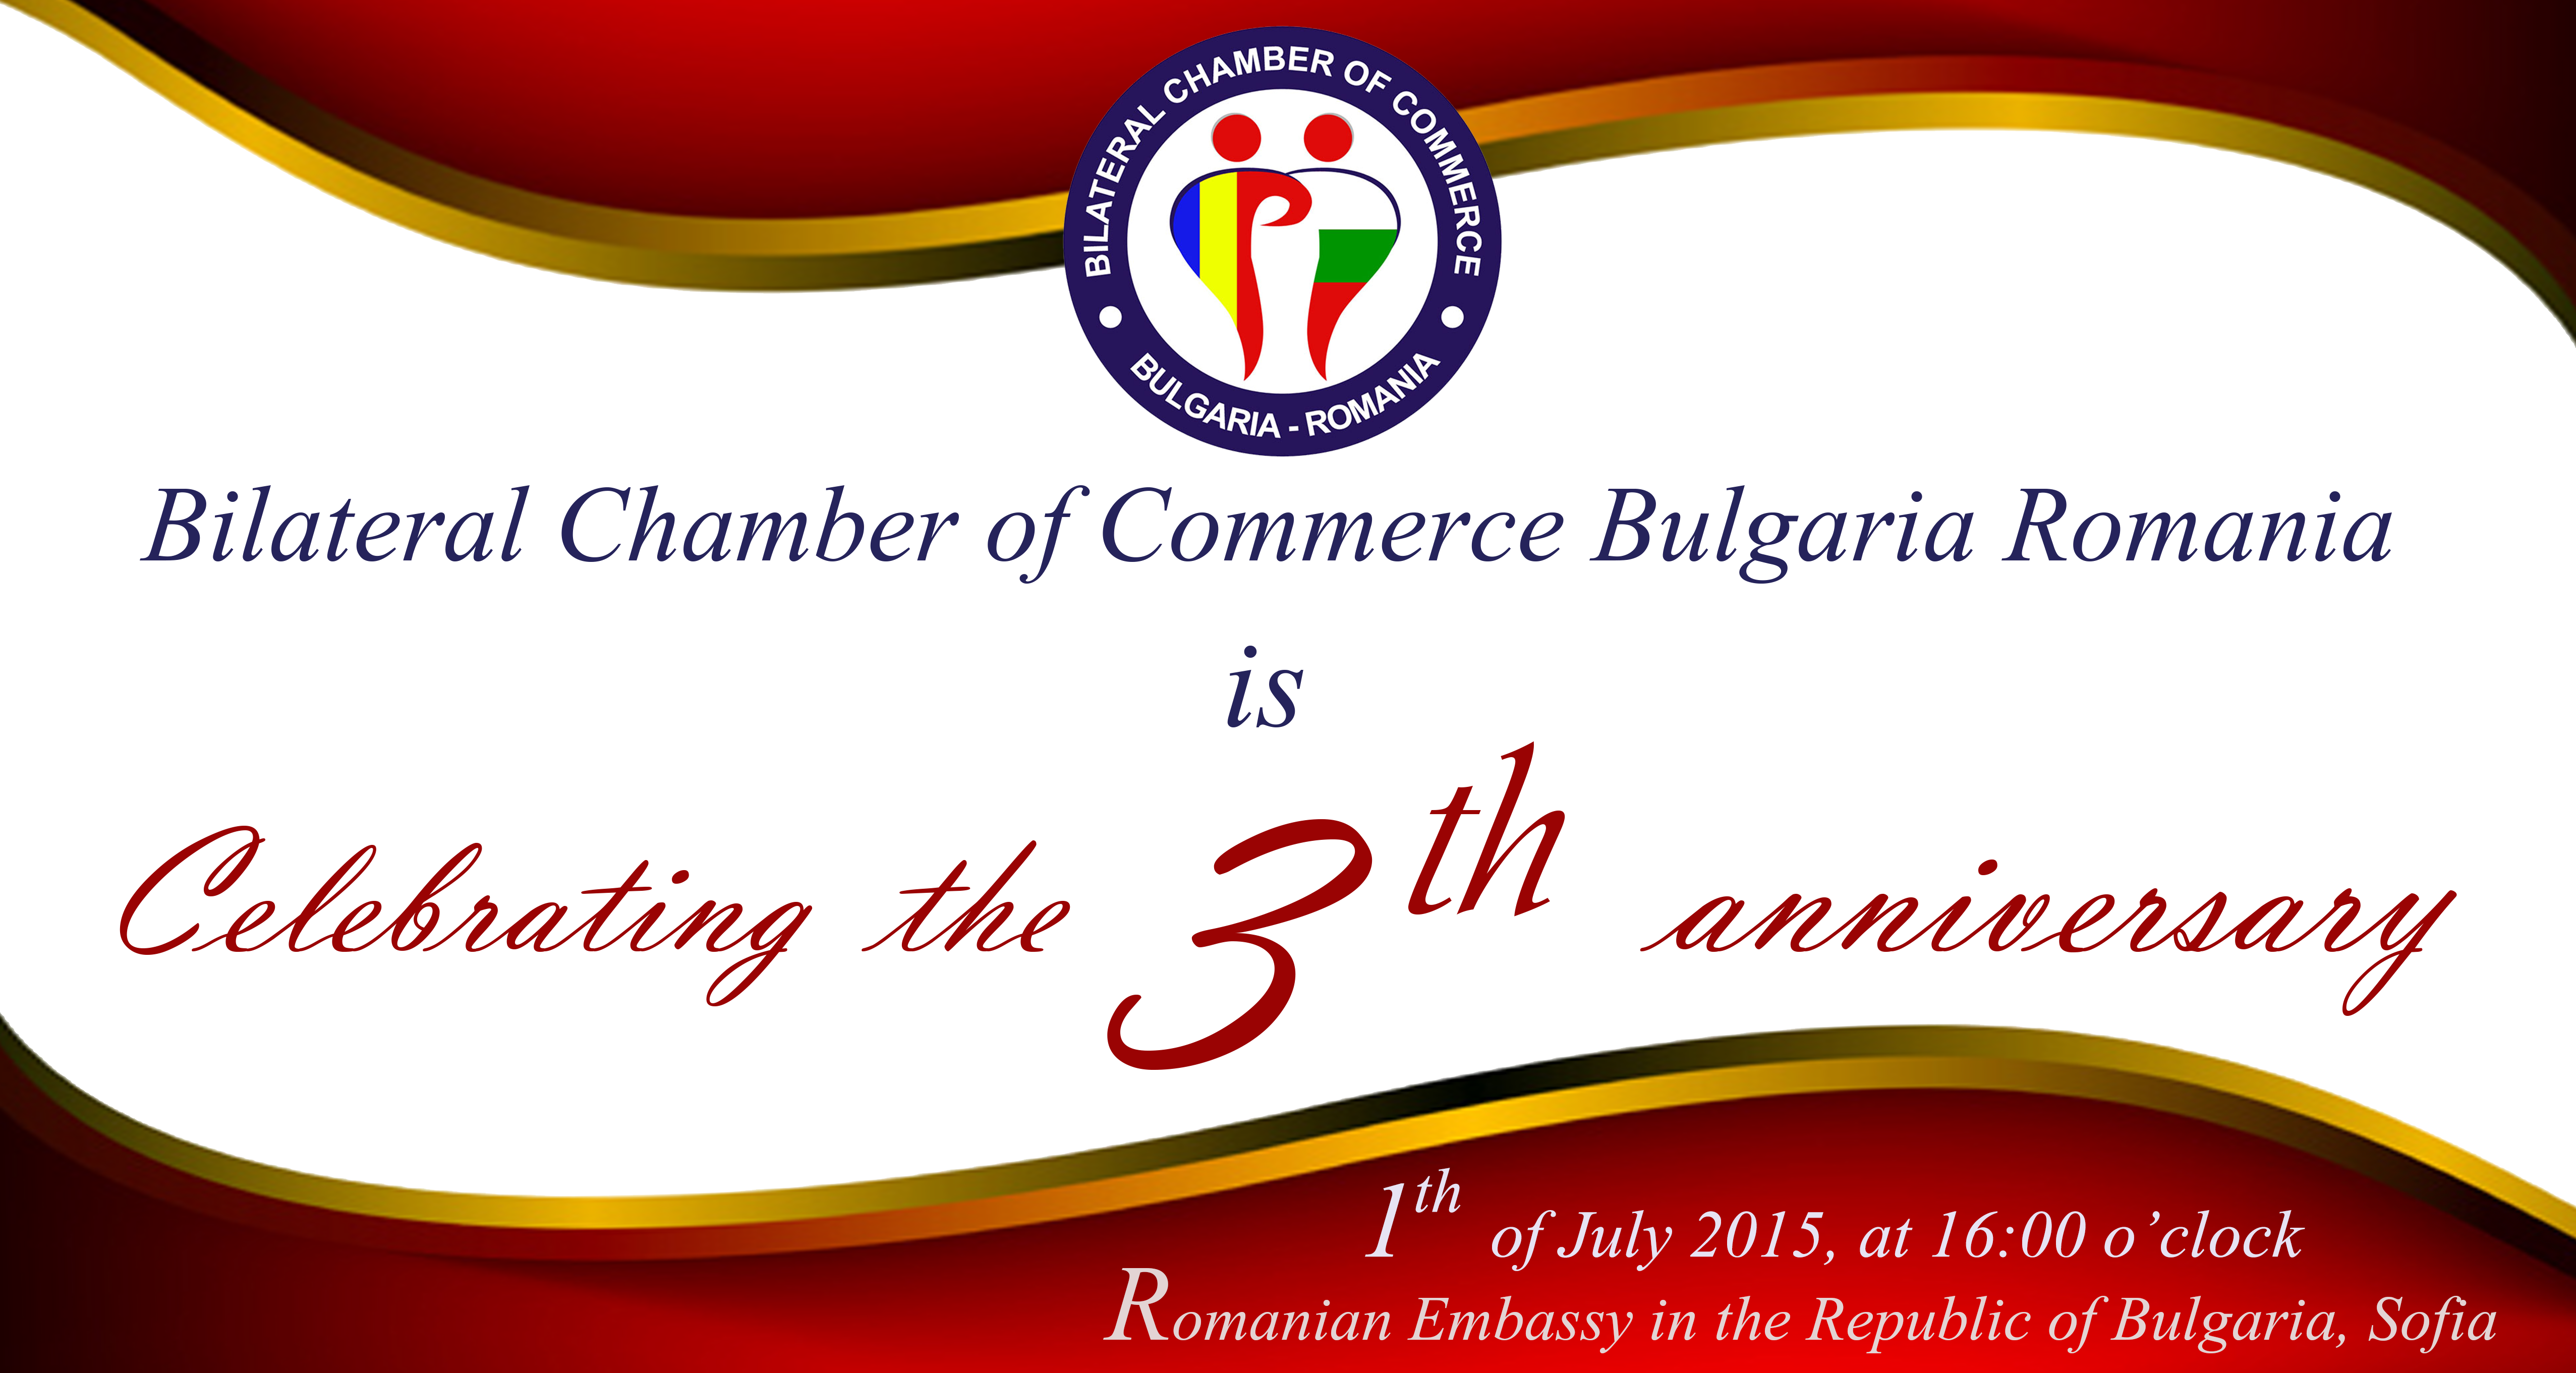 3rd Anniversary celebration